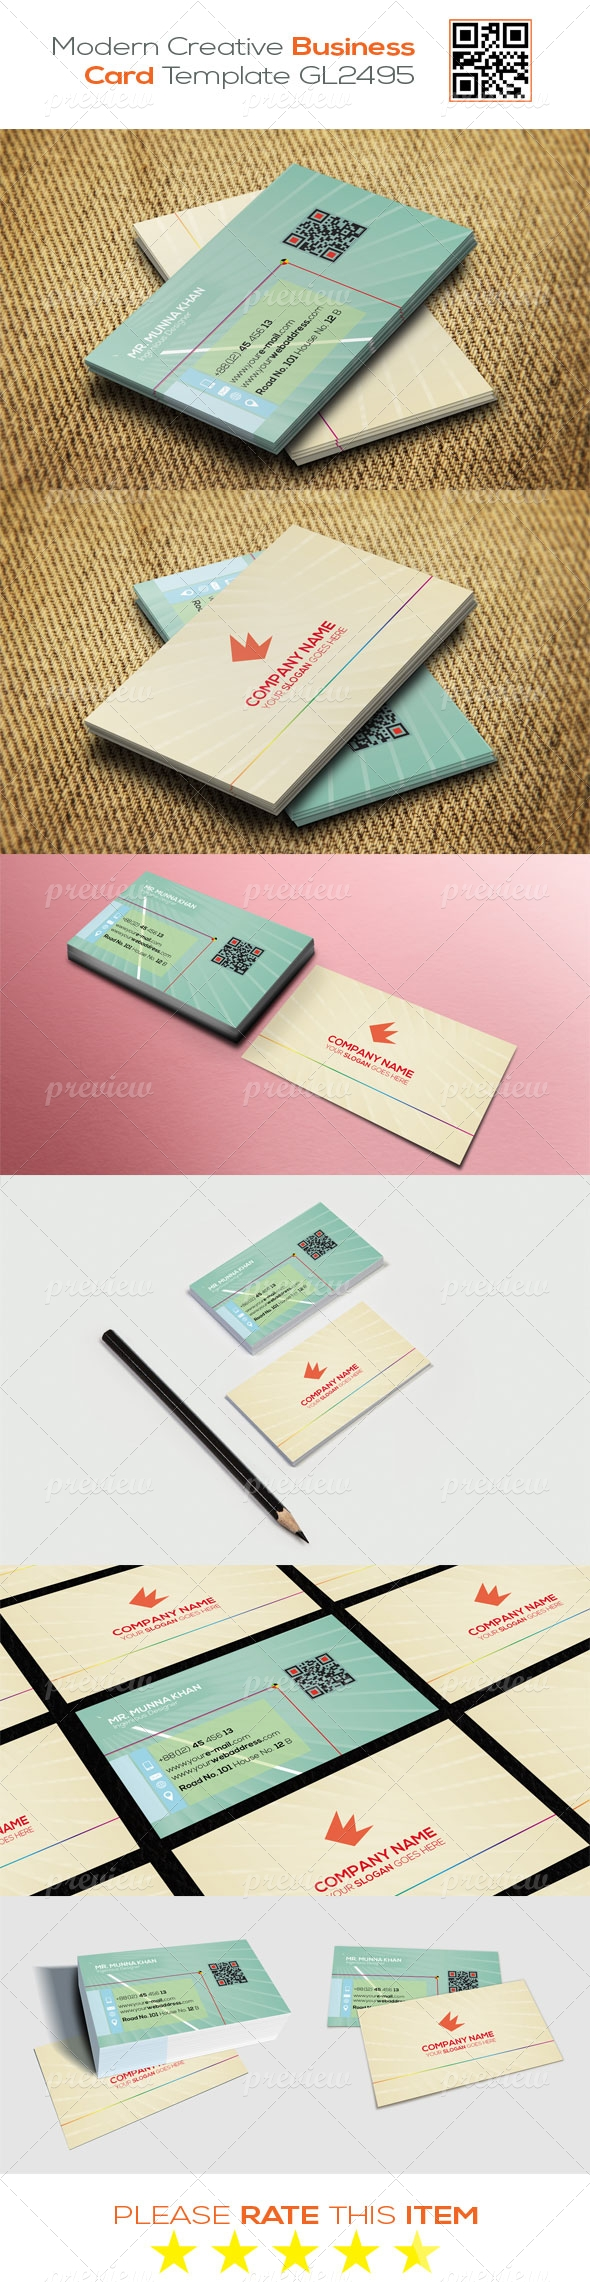 Modern Creative Business Card Template GL2495